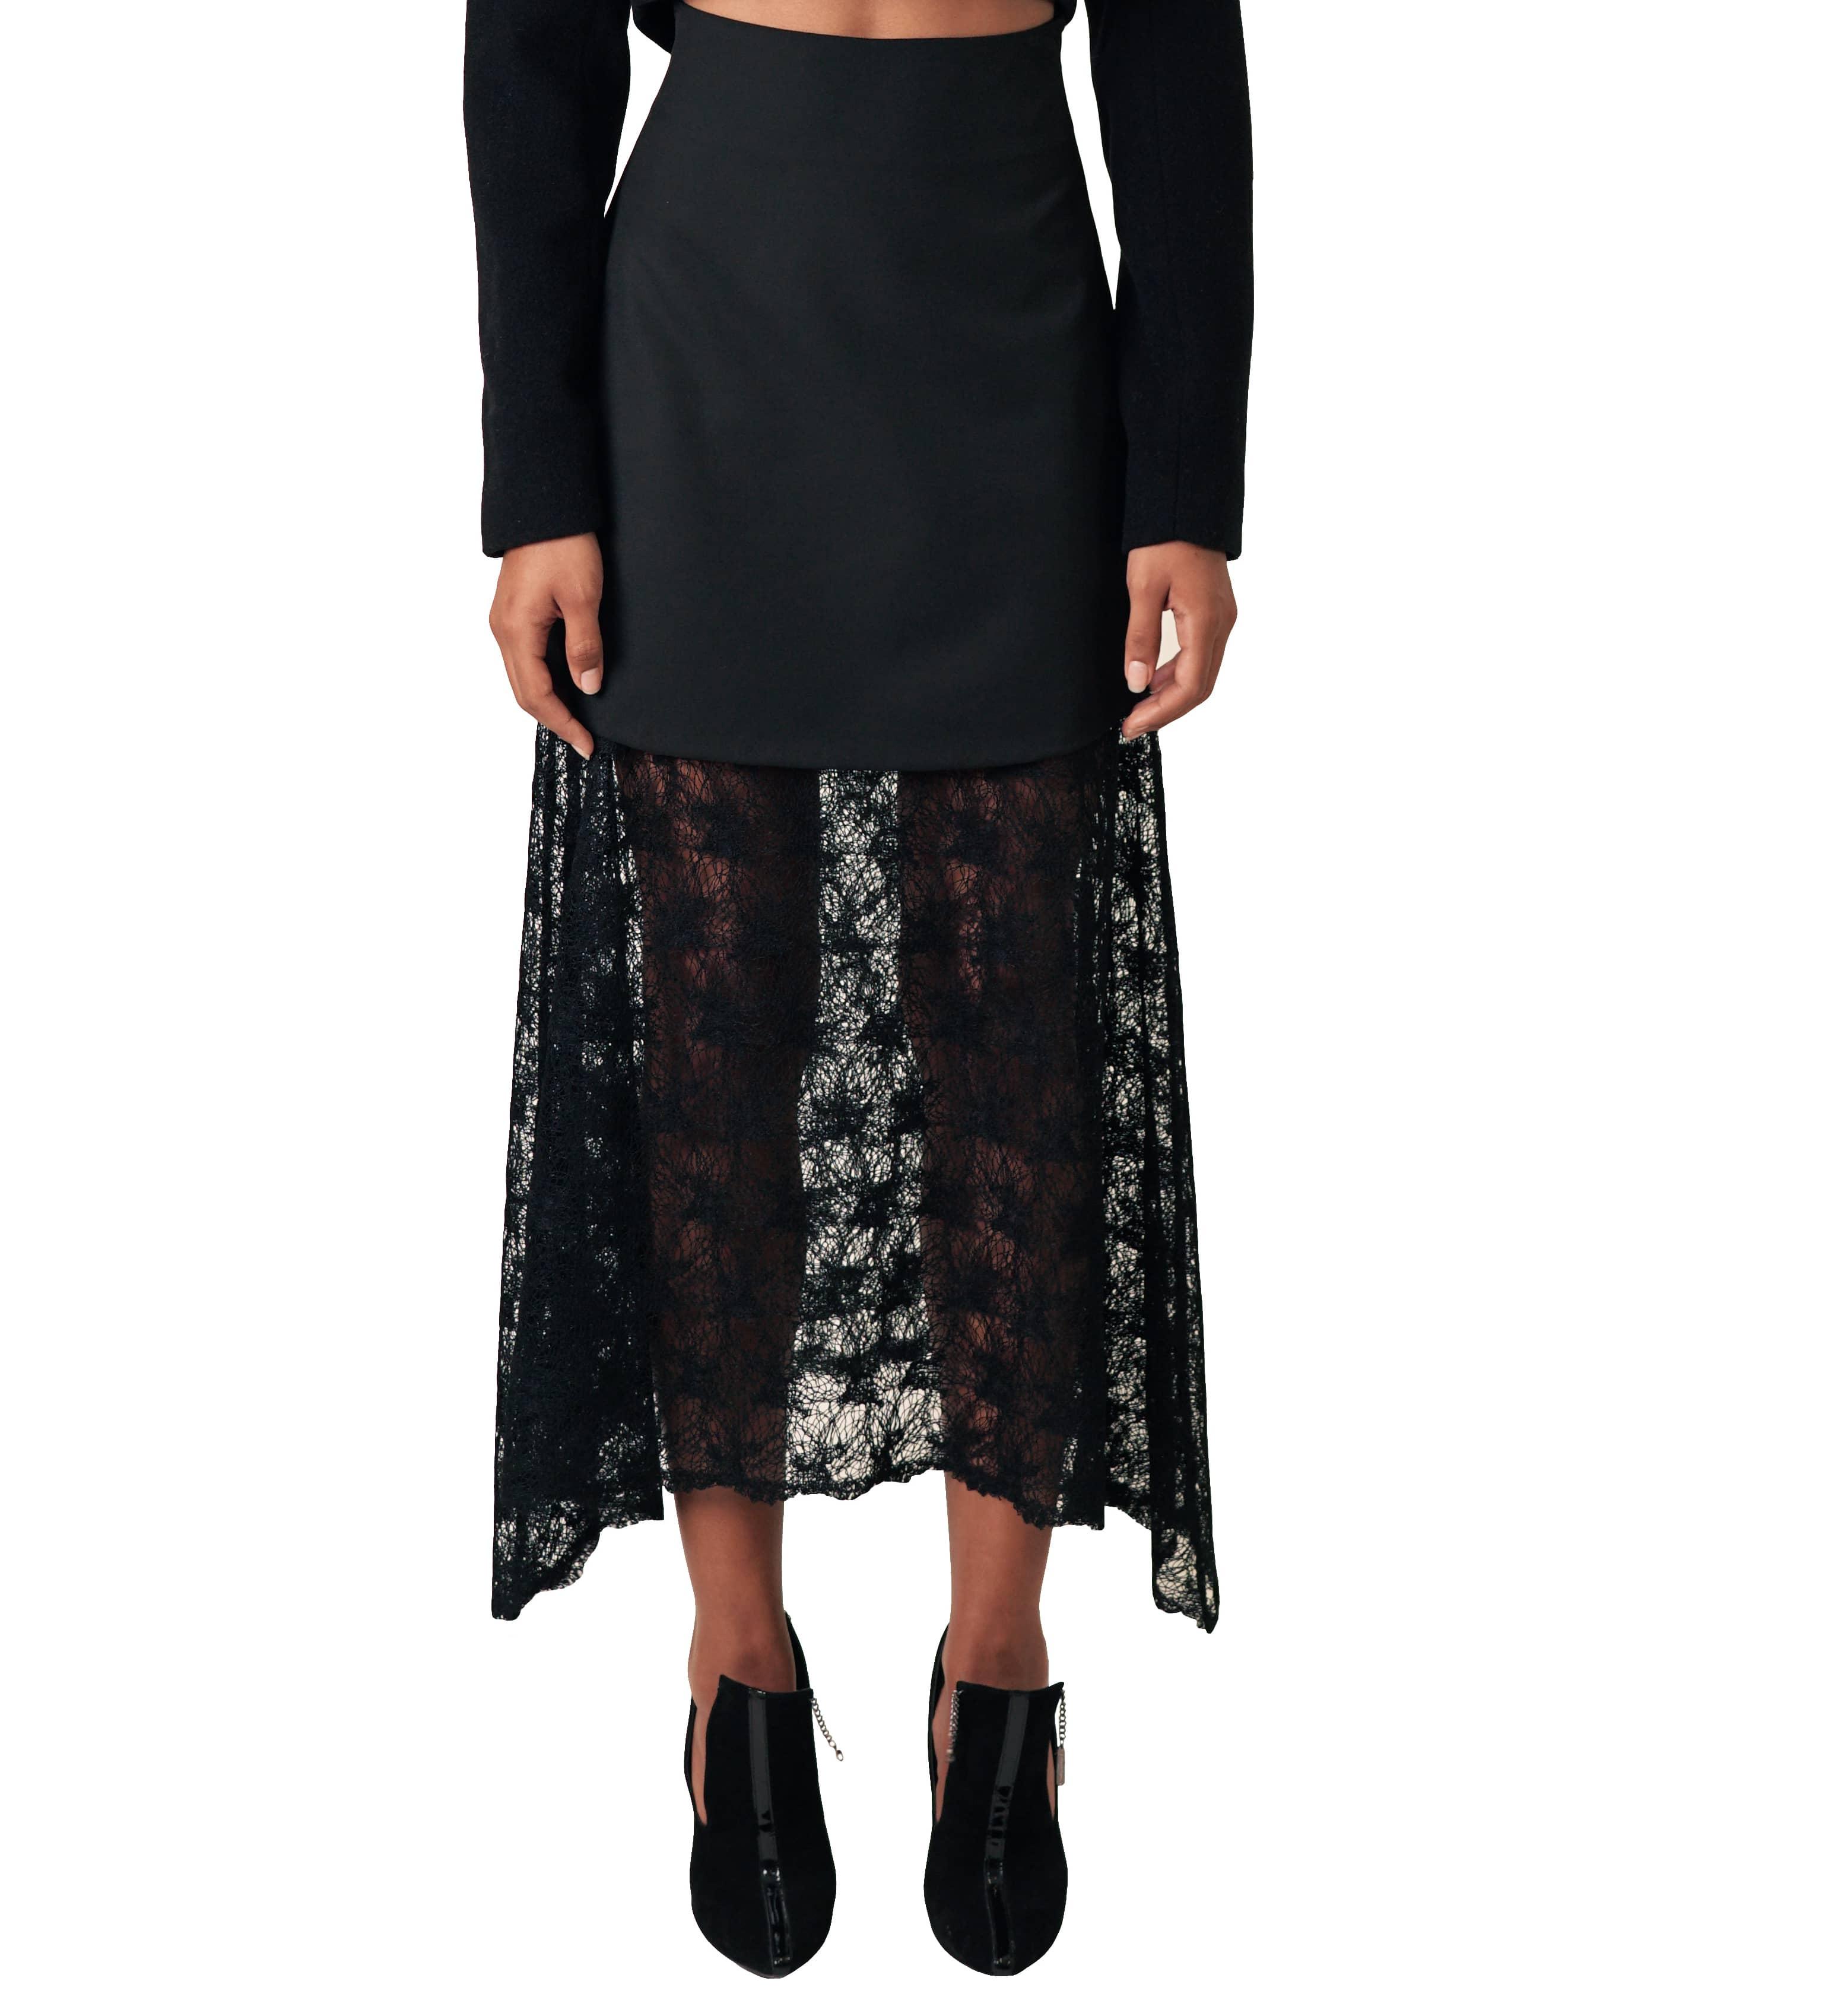 Skirt BERMUDA 0